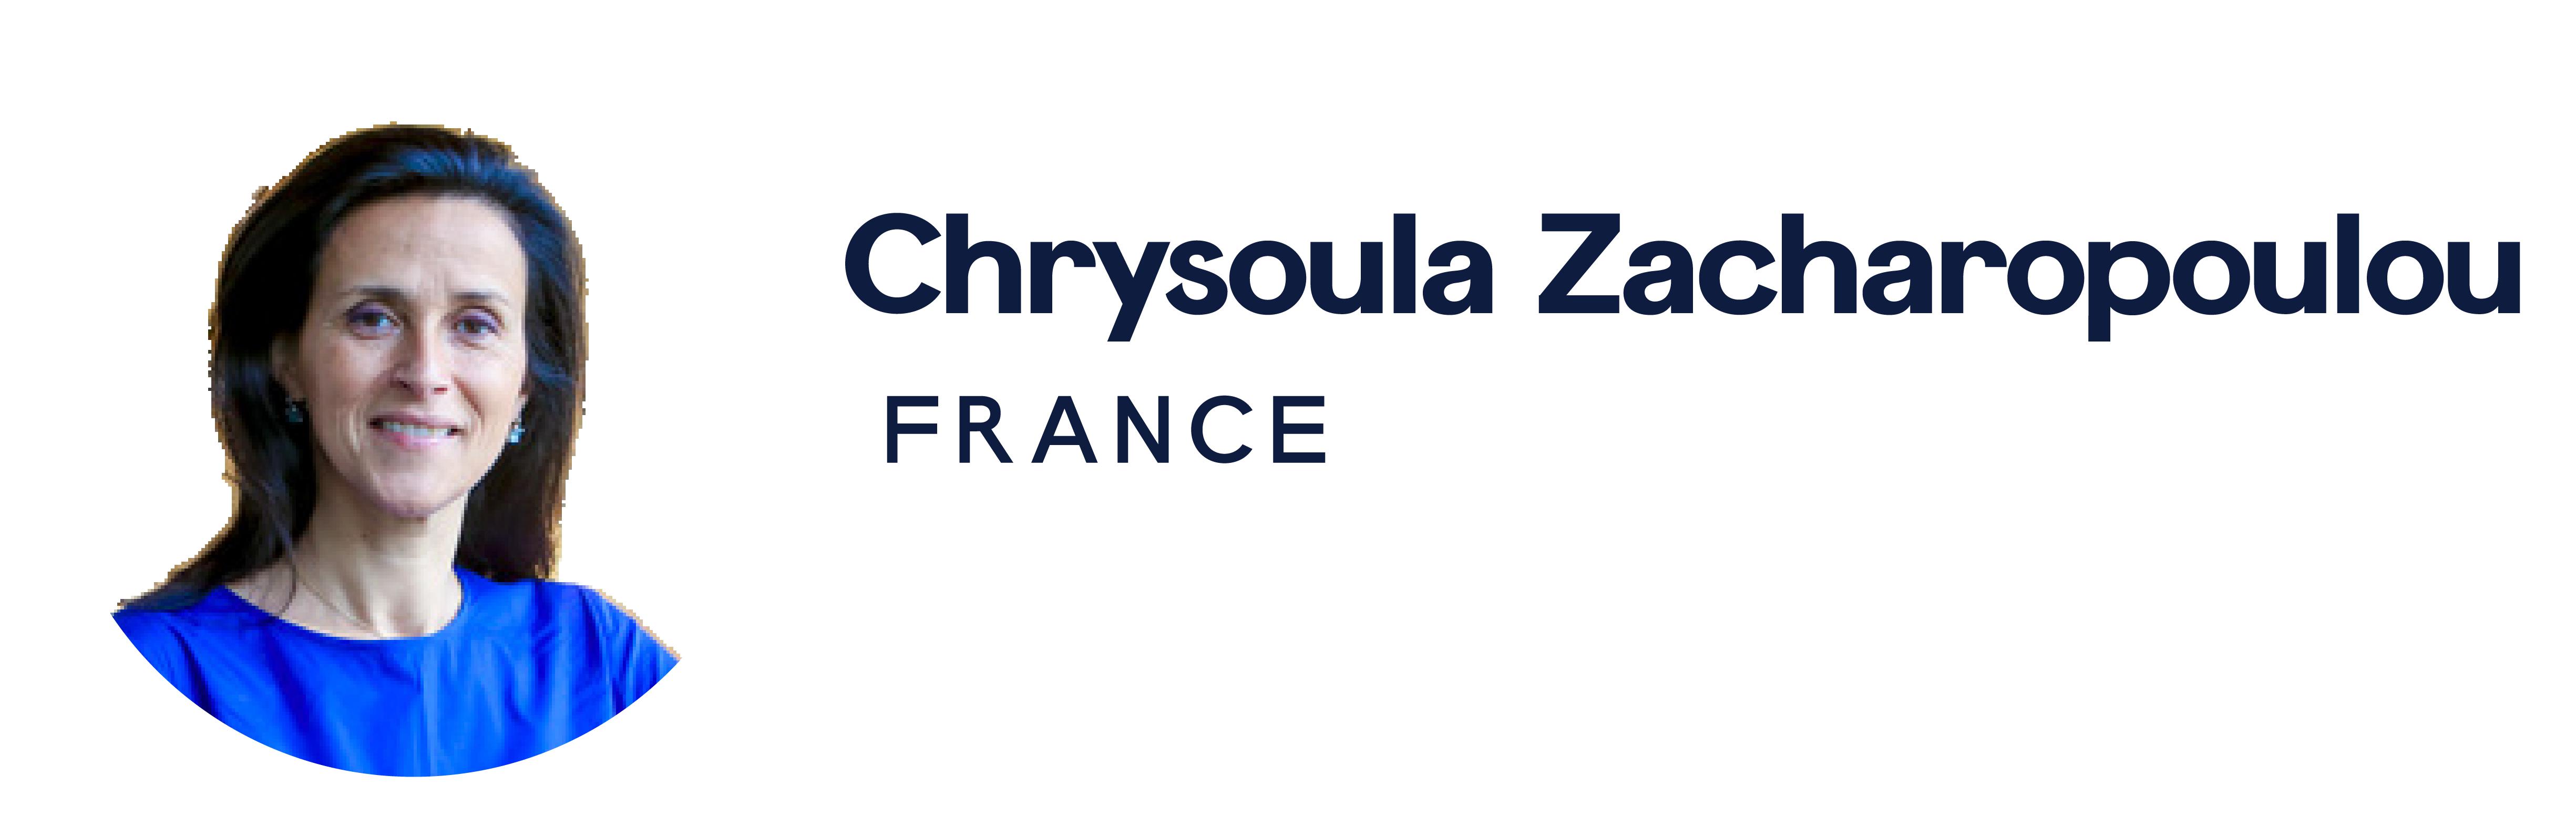 Chrysoula Zacharopoulou